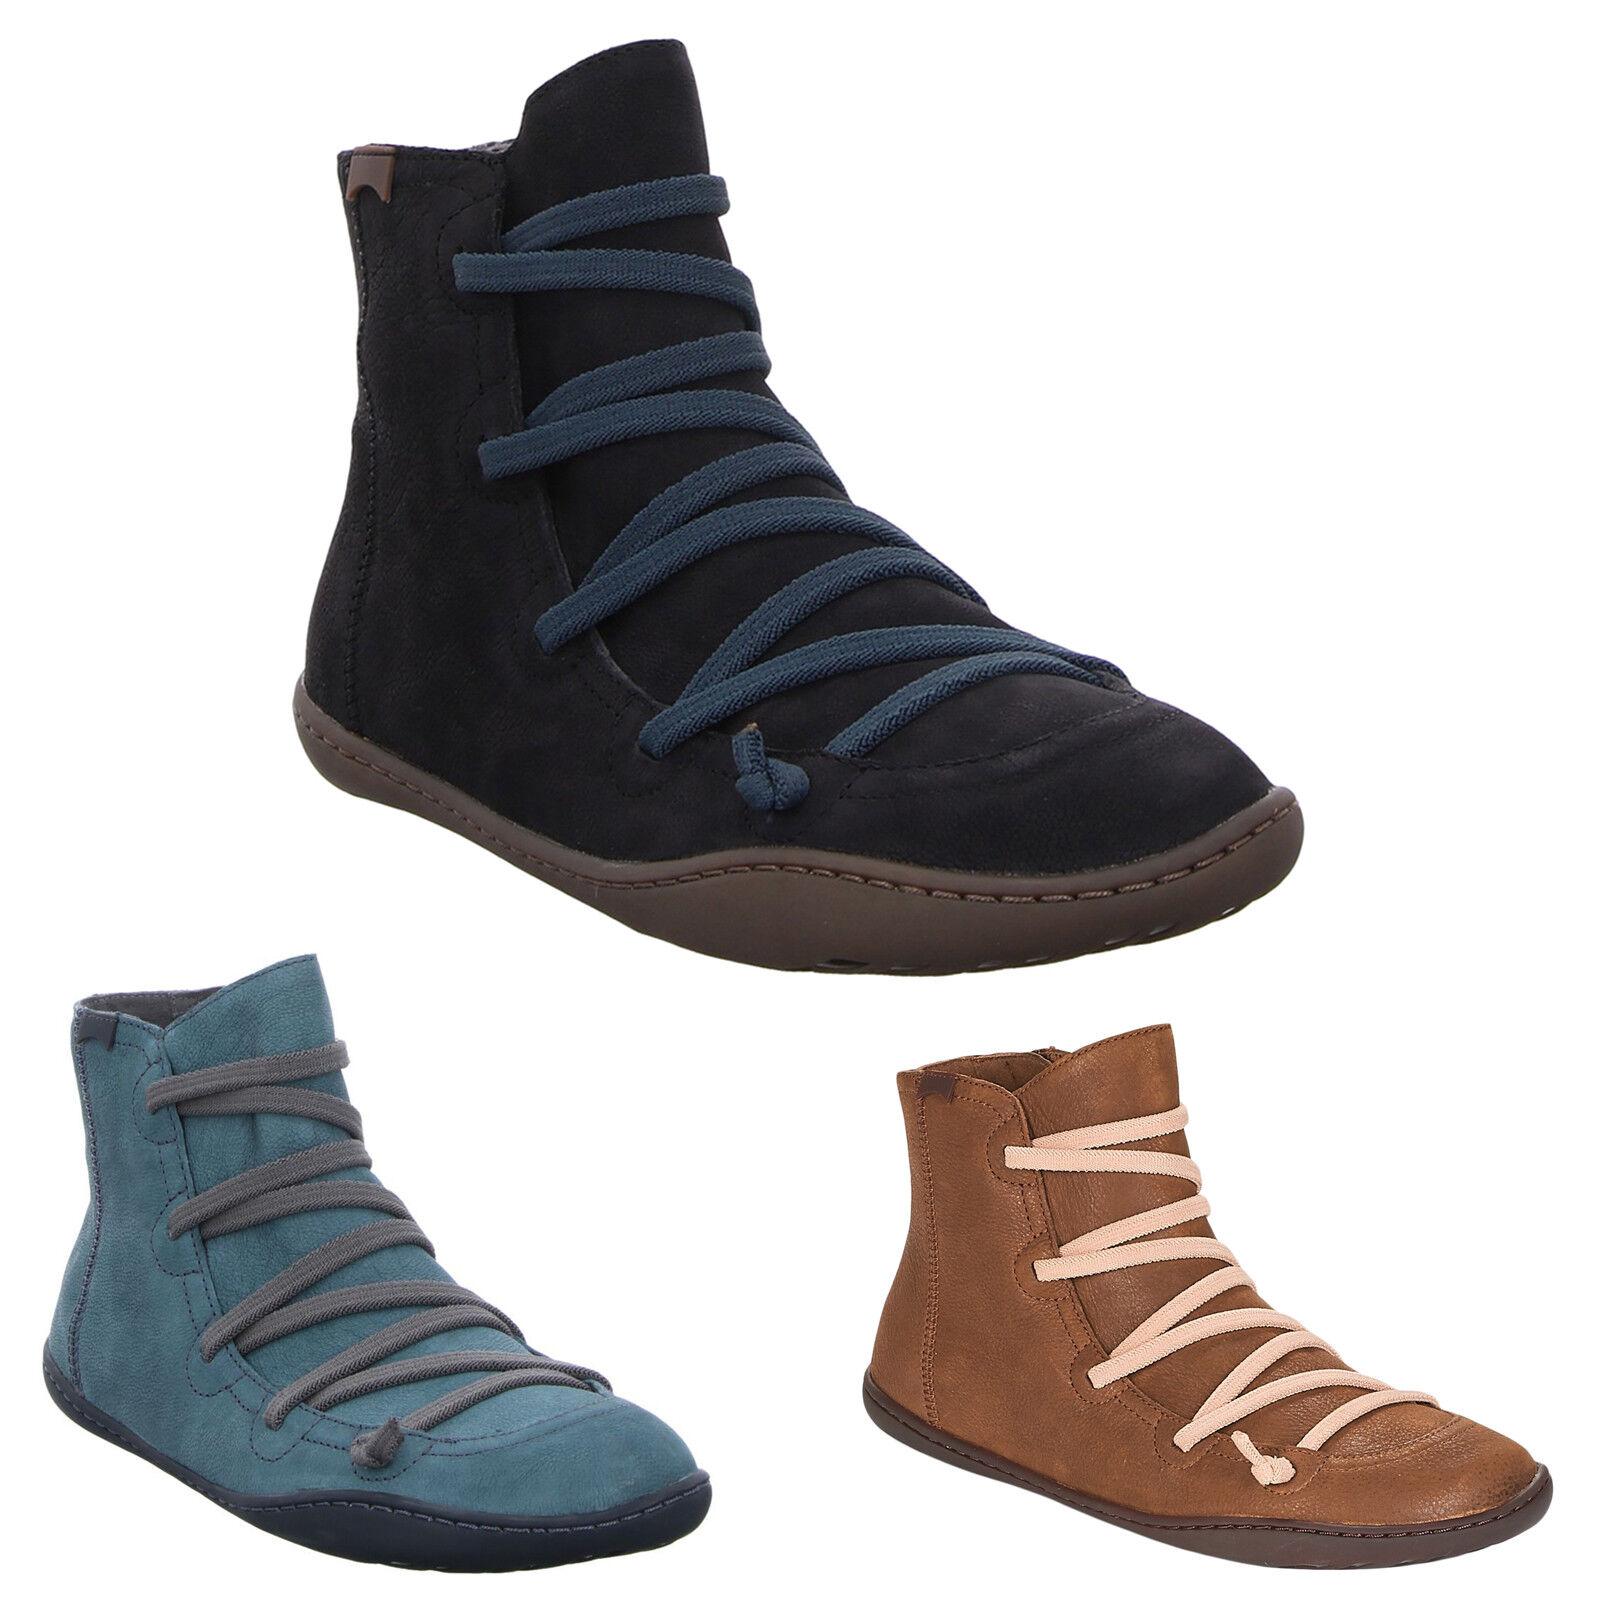 Camper Peu Cami Leder Casual Zip-Up Ankle Damen Stiefel